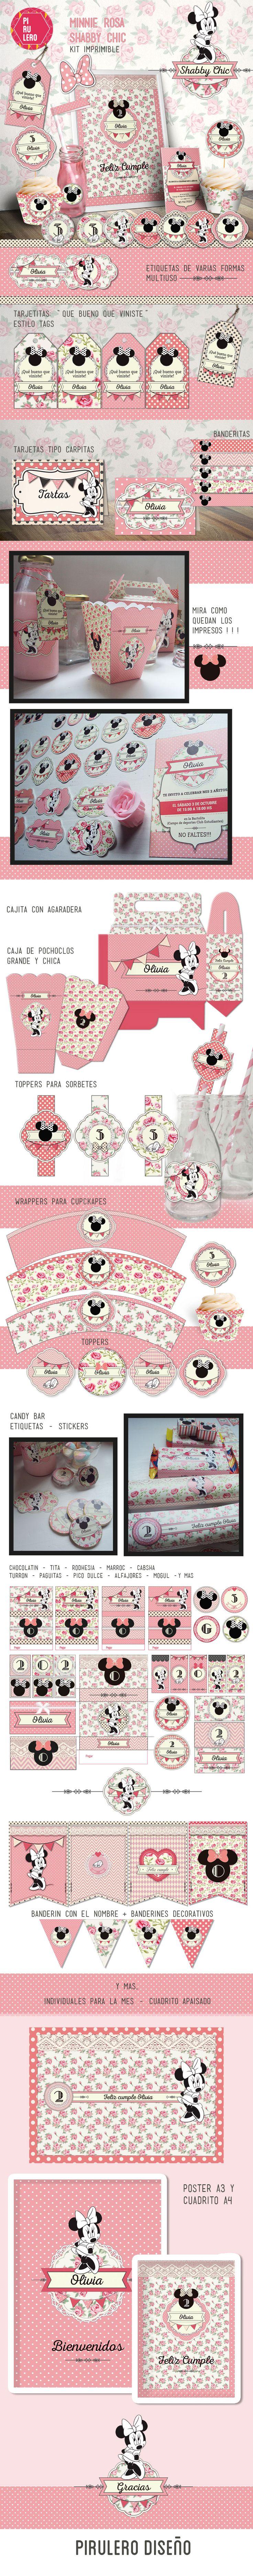 Kit imprimible Minnie Shabby Chic Rosa #kitimprimible #shabbychic #shabby #minnie